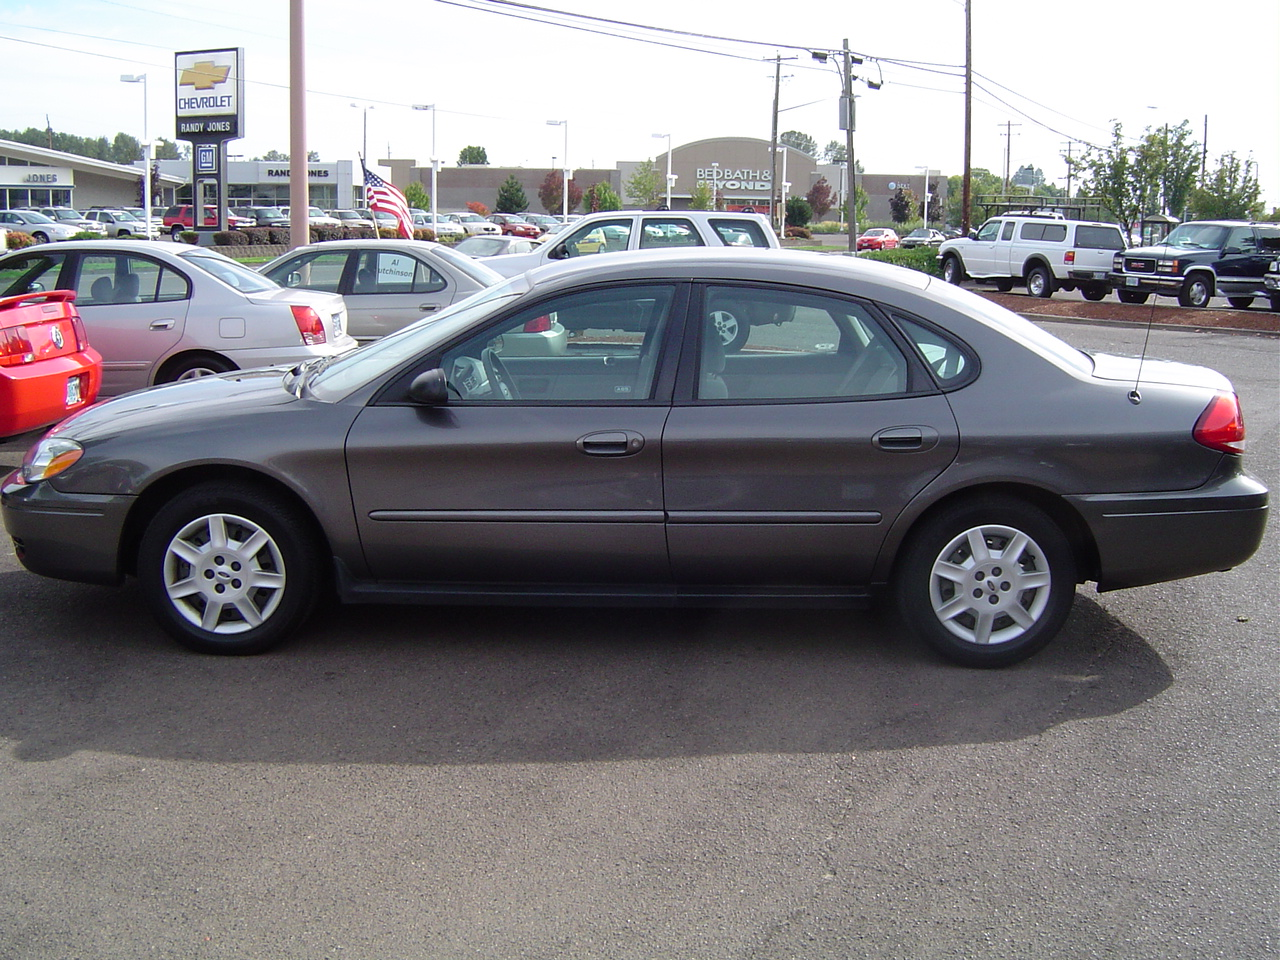 2005 Ford Taurus Image 11